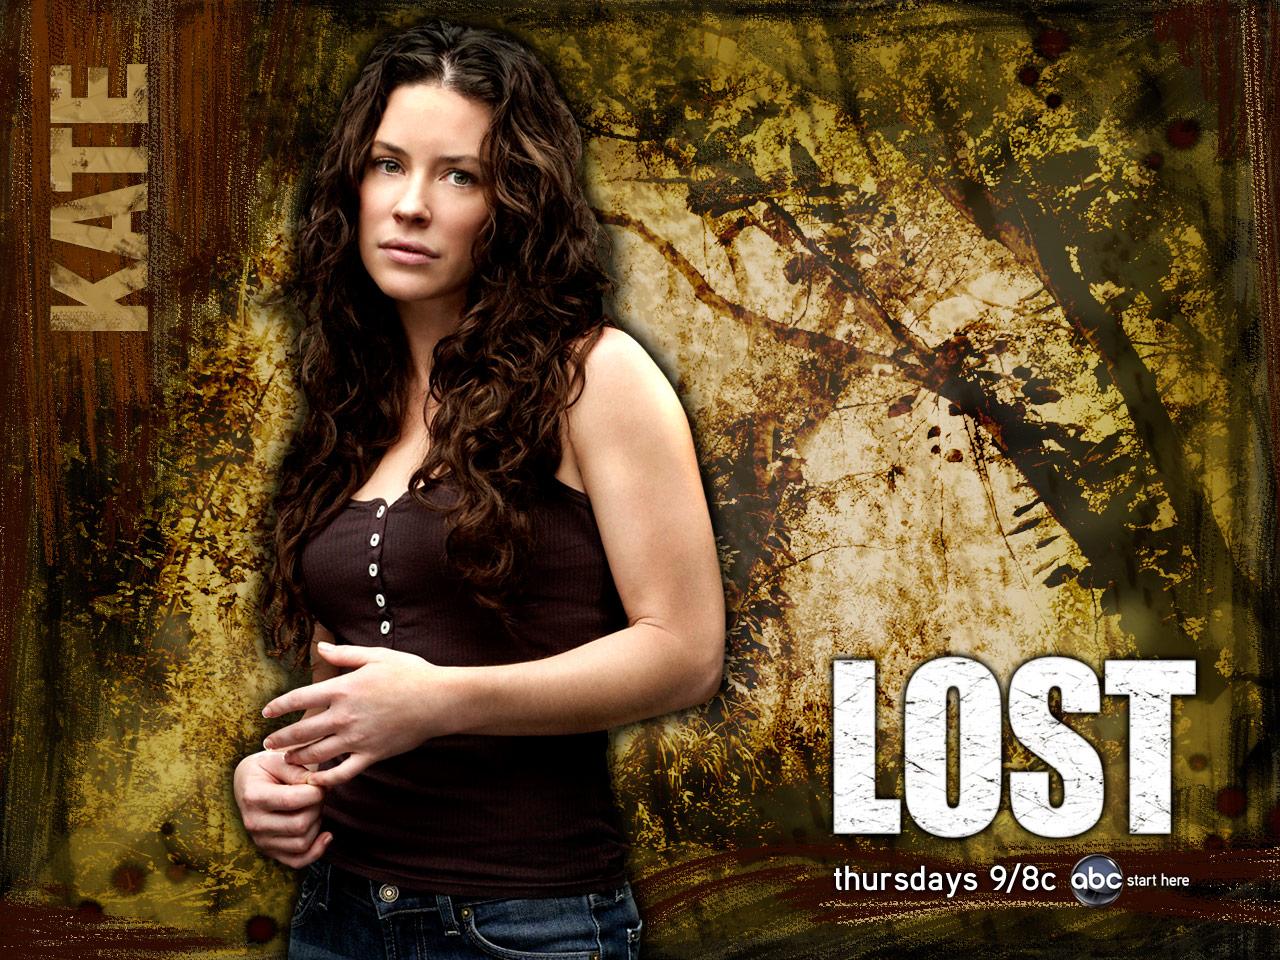 http://2.bp.blogspot.com/-RTTyrIdl-74/TxxLIutkpsI/AAAAAAAAAco/83FD9HWzQoE/s1600/Evangeline_Lilly_in_Lost_TV_Series_Wallpaper_1_800.jpg